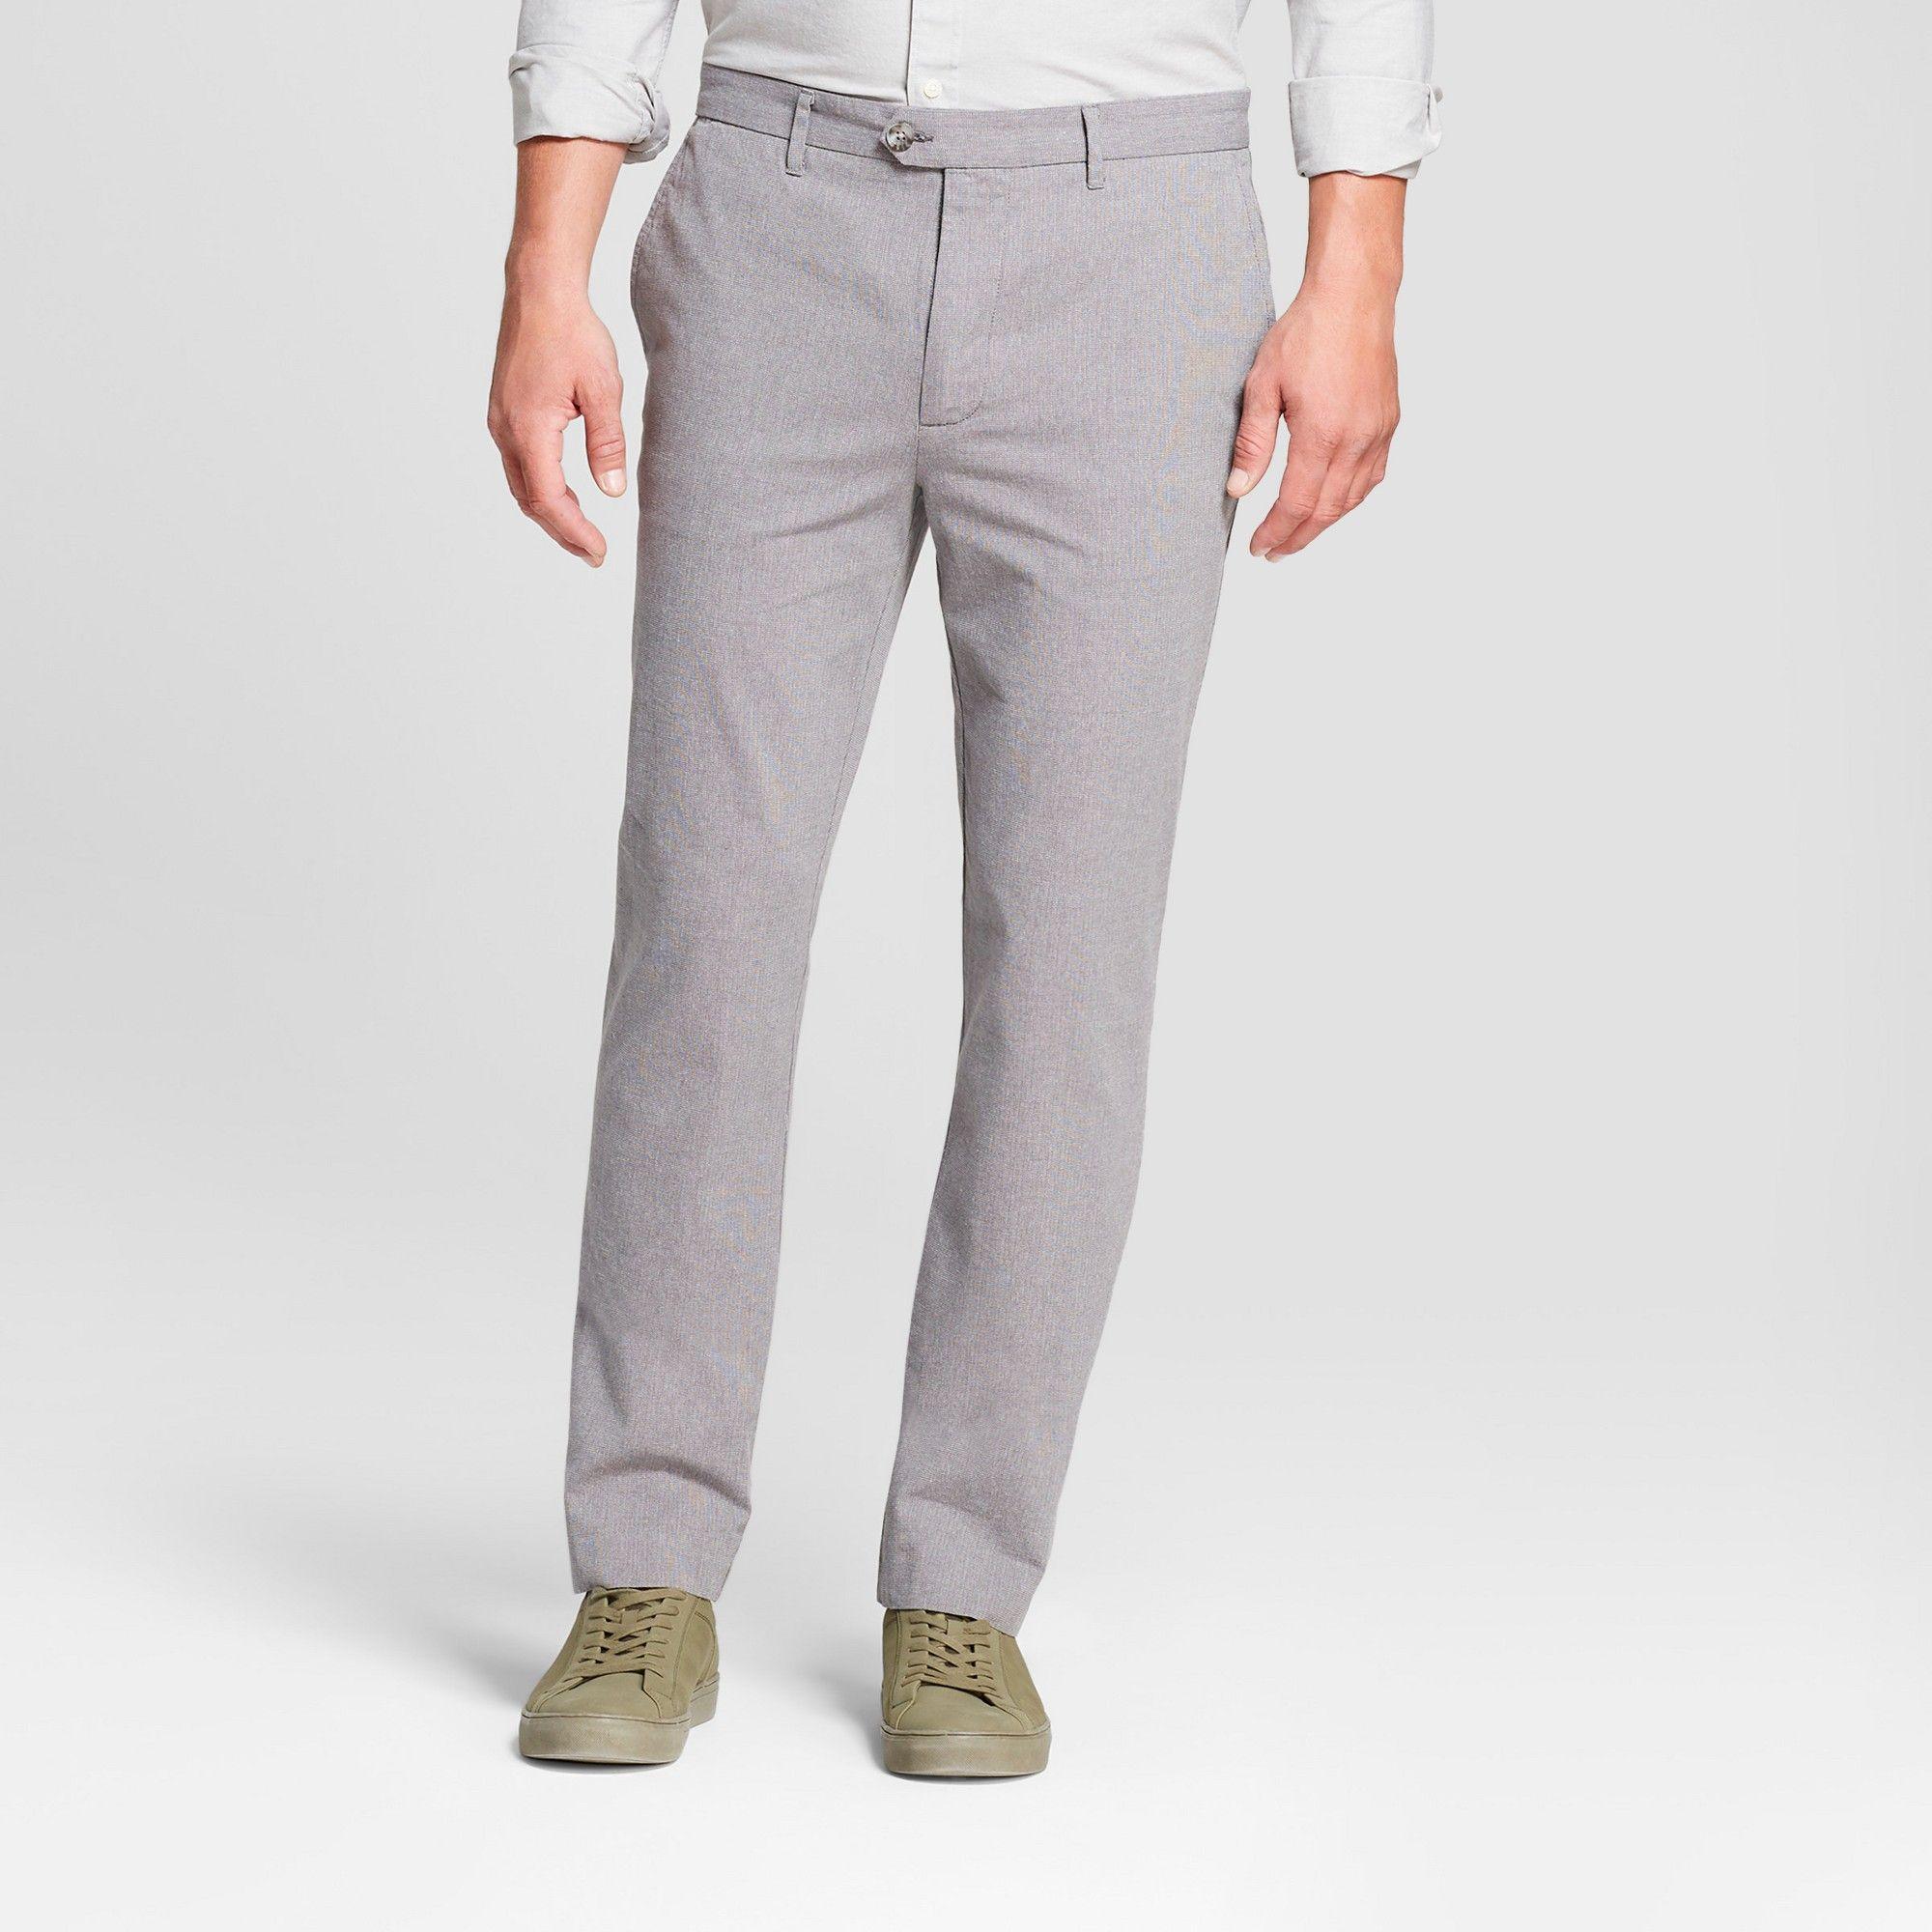 f977ee19 Men's Printed Straight Fit Lightweight Trouser - Goodfellow & Co Gray  Herringbone 36x32